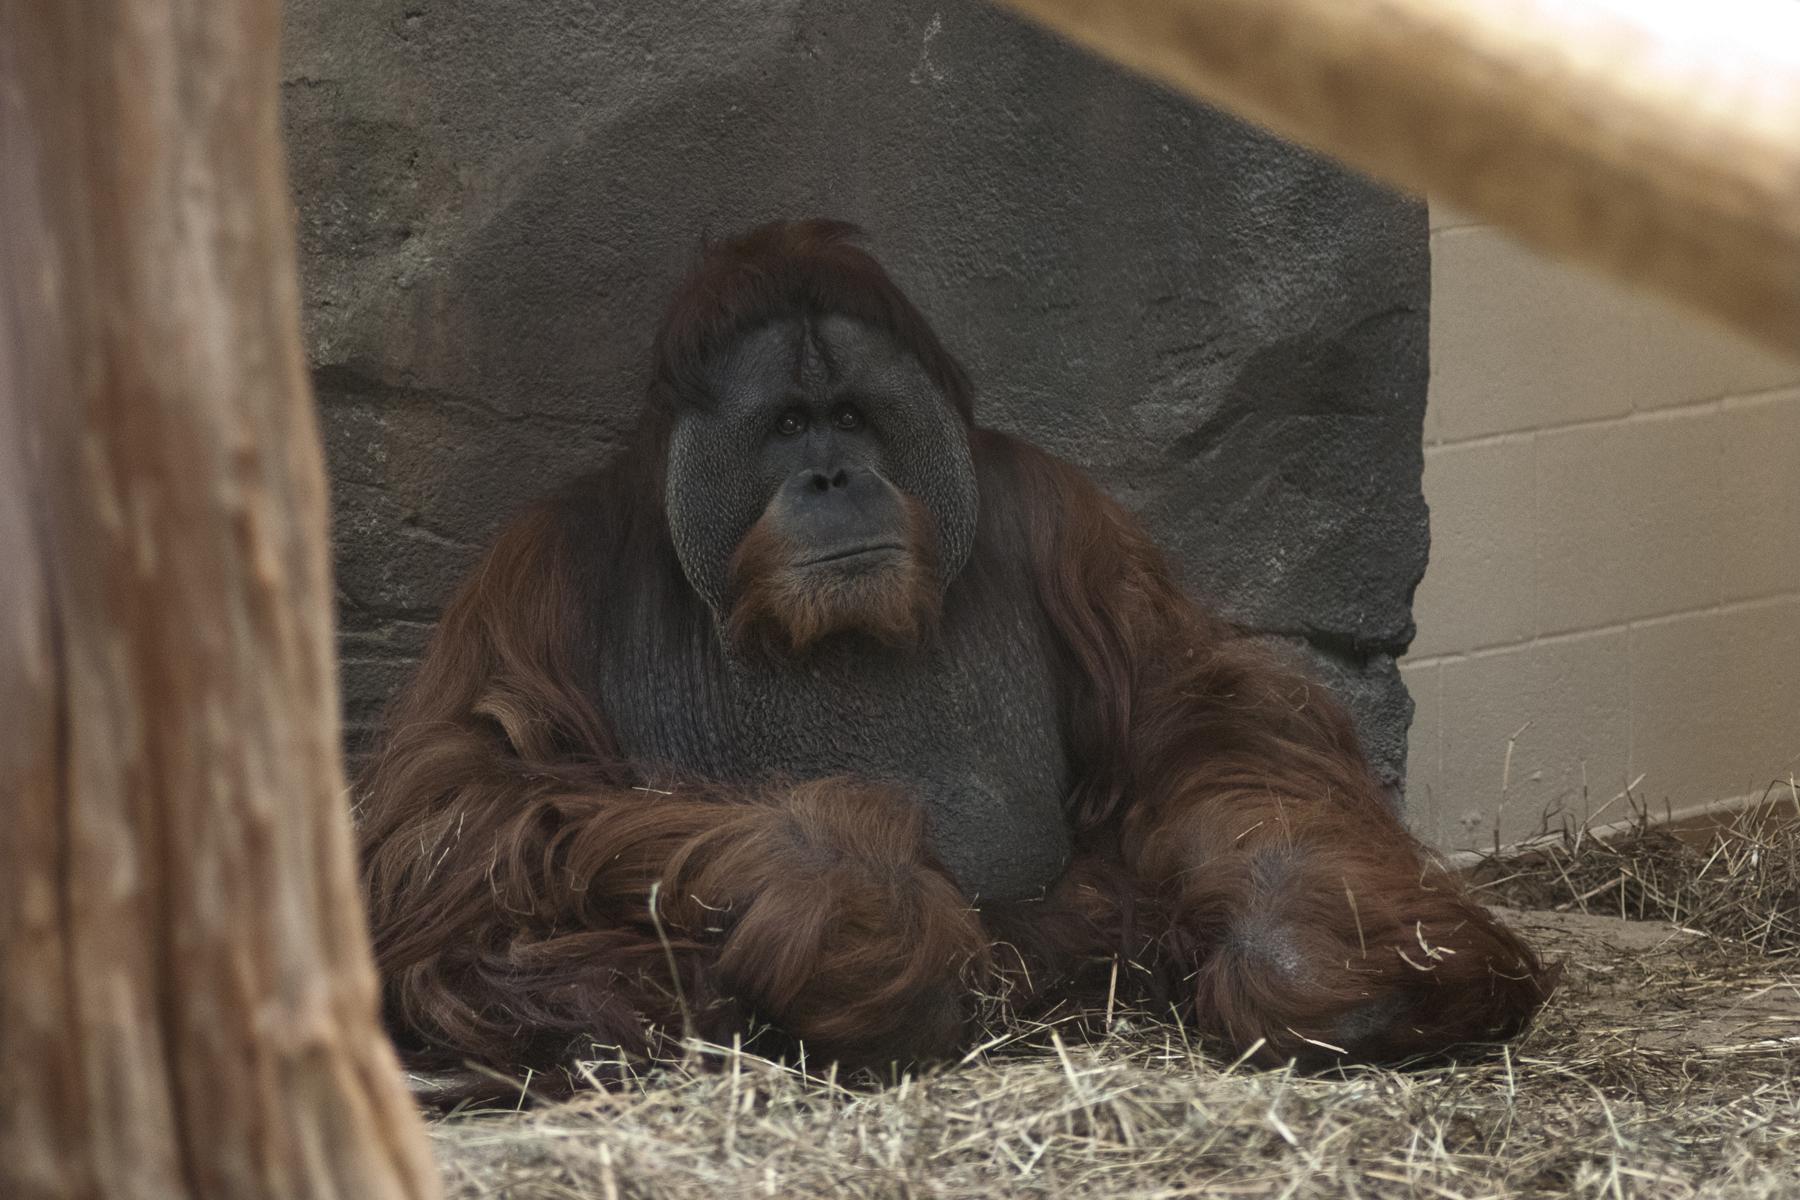 orangutan photo at the virginia zoo